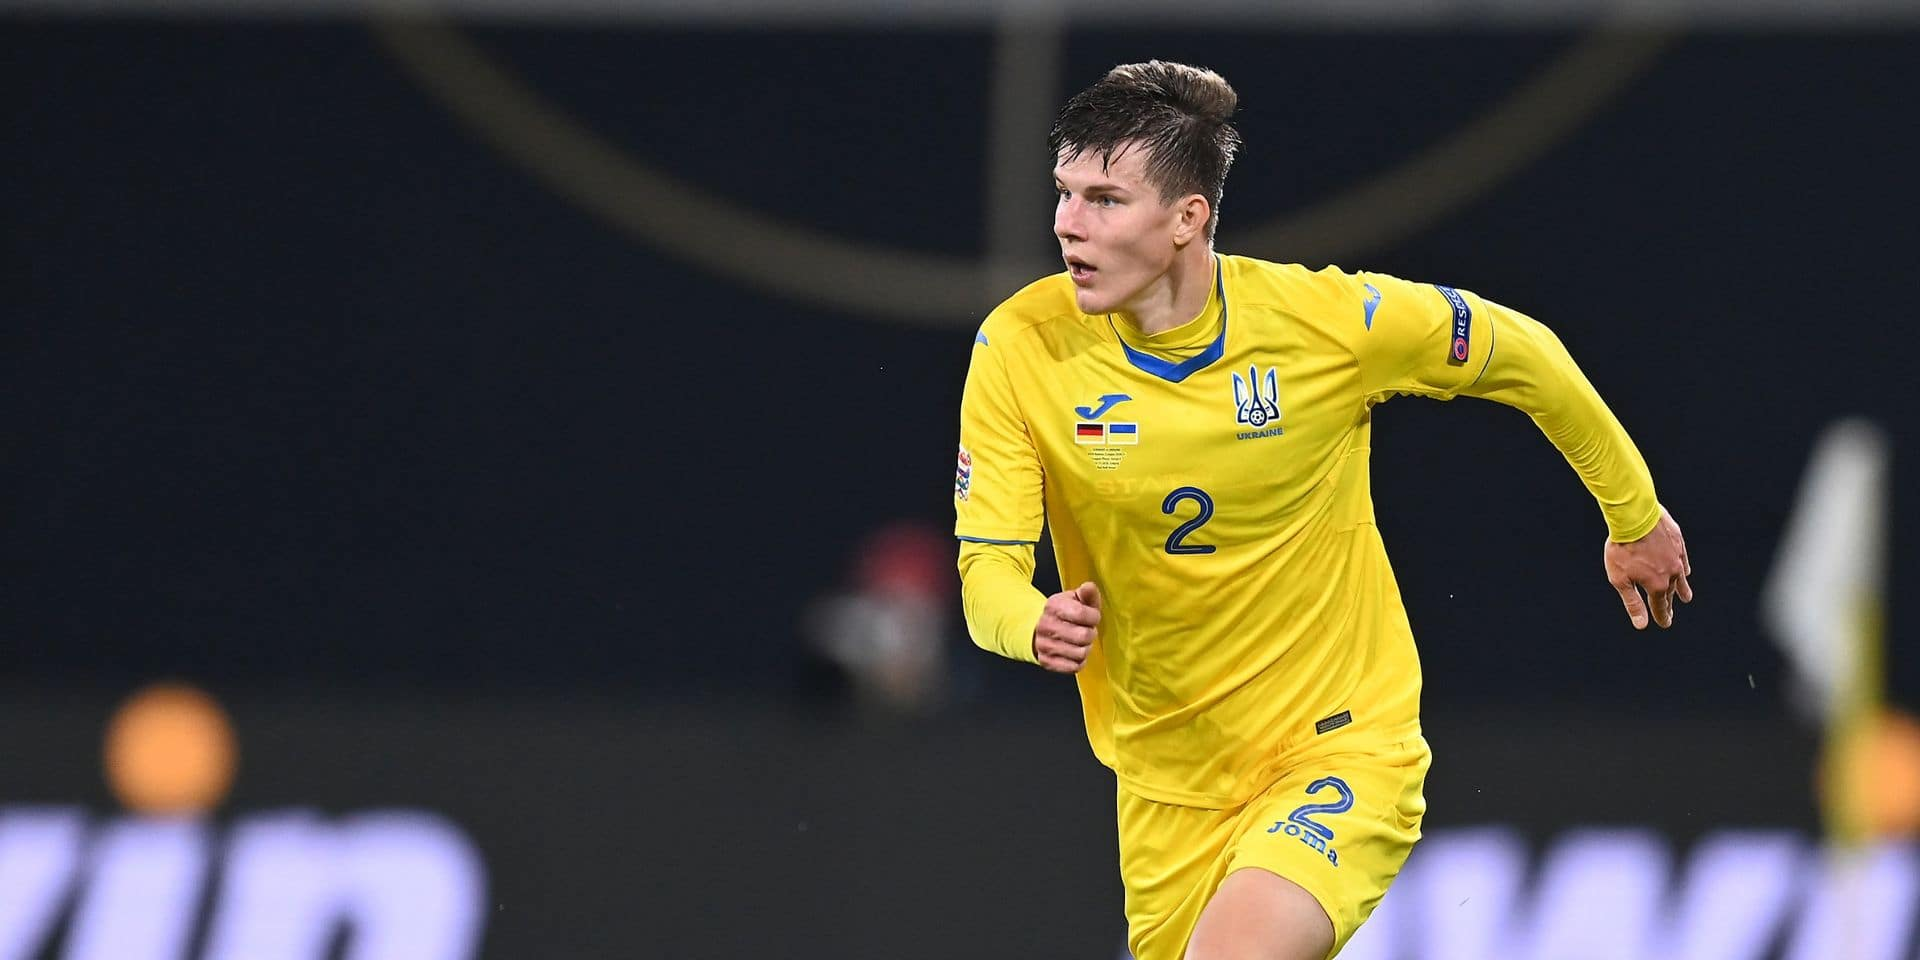 Les Ukrainiens Sobol (FC Bruges) et Makarenko (Courtrai) testés positifs au coronavirus